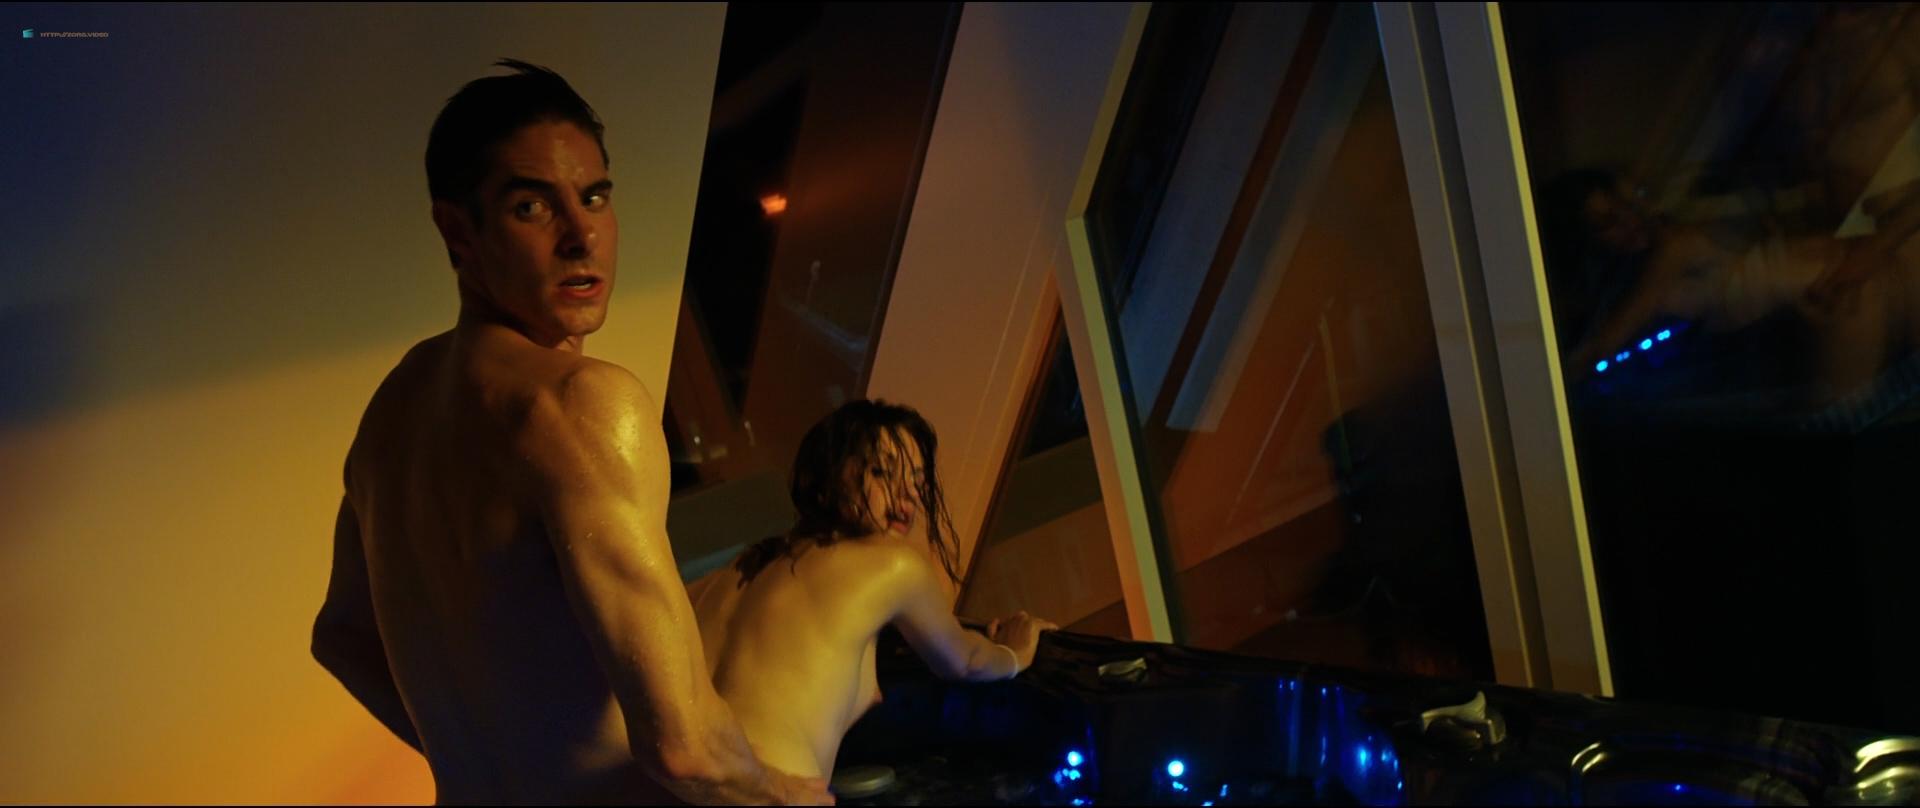 Holly Mae Brood hot and sexy Carolien Spoor, Marly van der Velden nude sex - Sneekweek (NL-2016) HD 1080p BluRay (8)